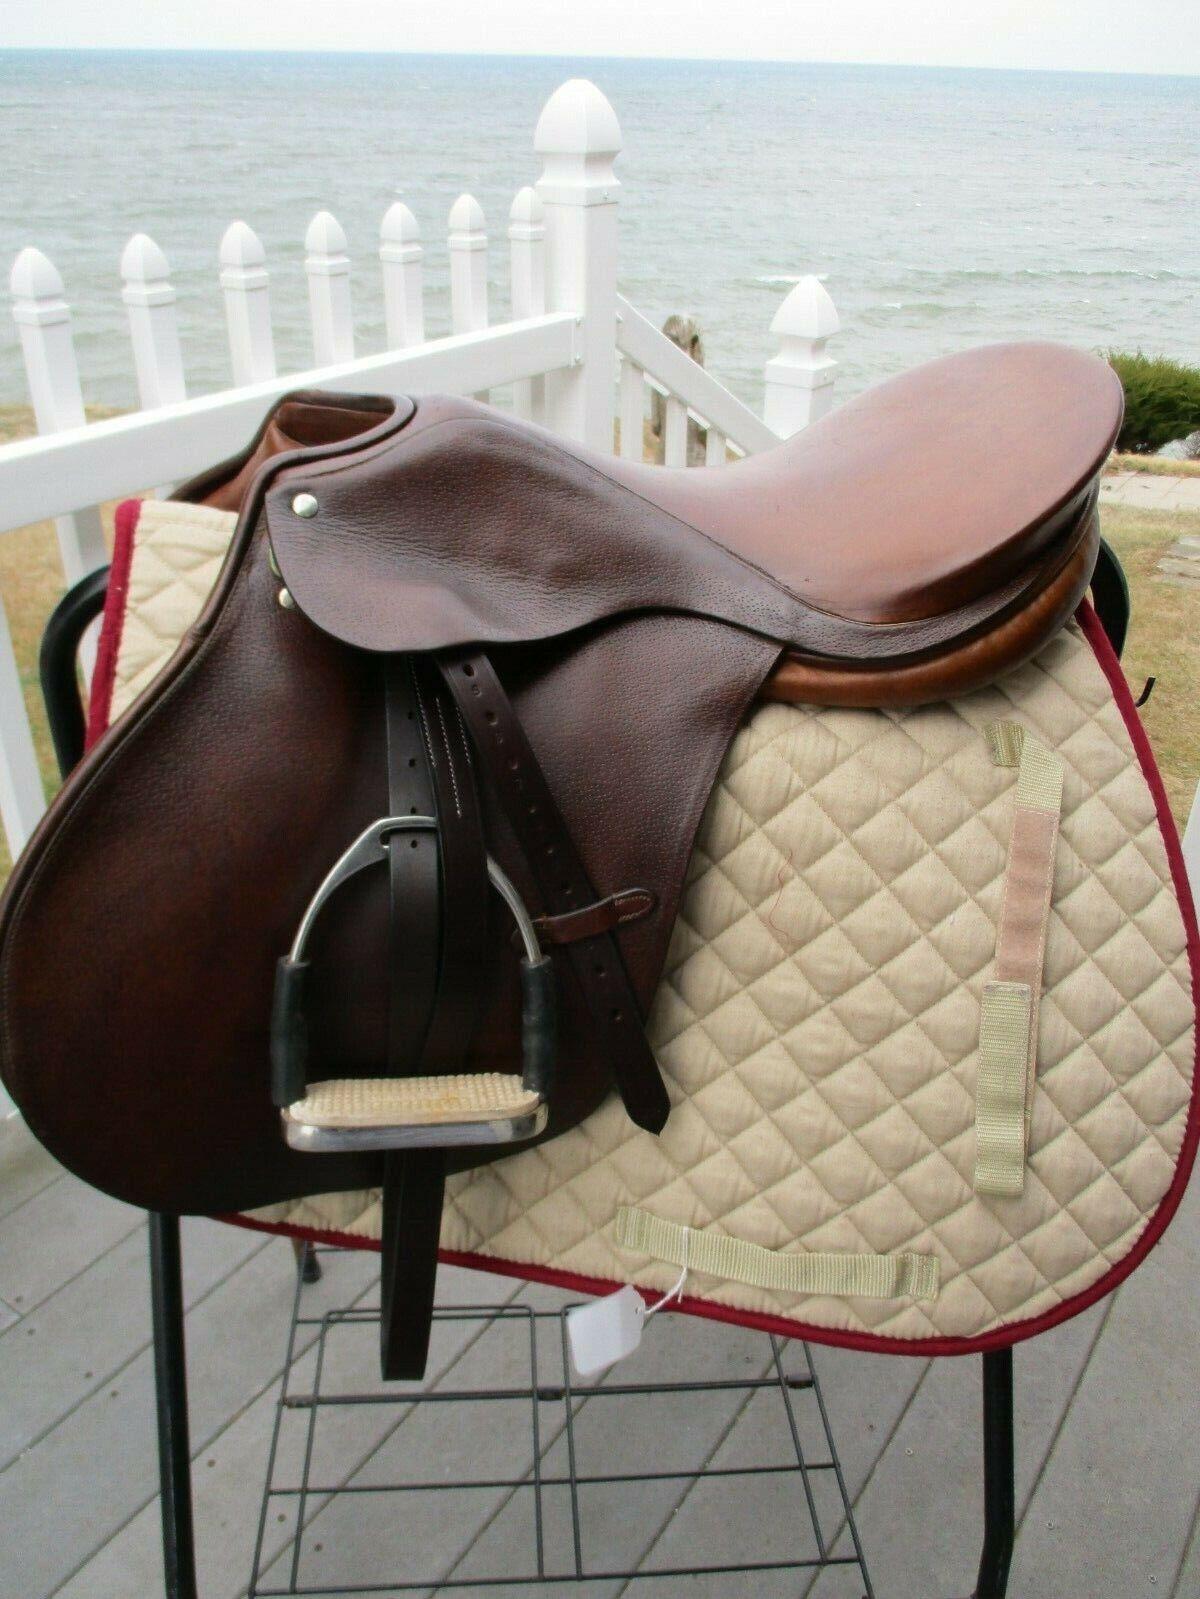 18 Narrow Zaldi ladyard CC inglese Saddle w Leathers & kiefer jointed irons